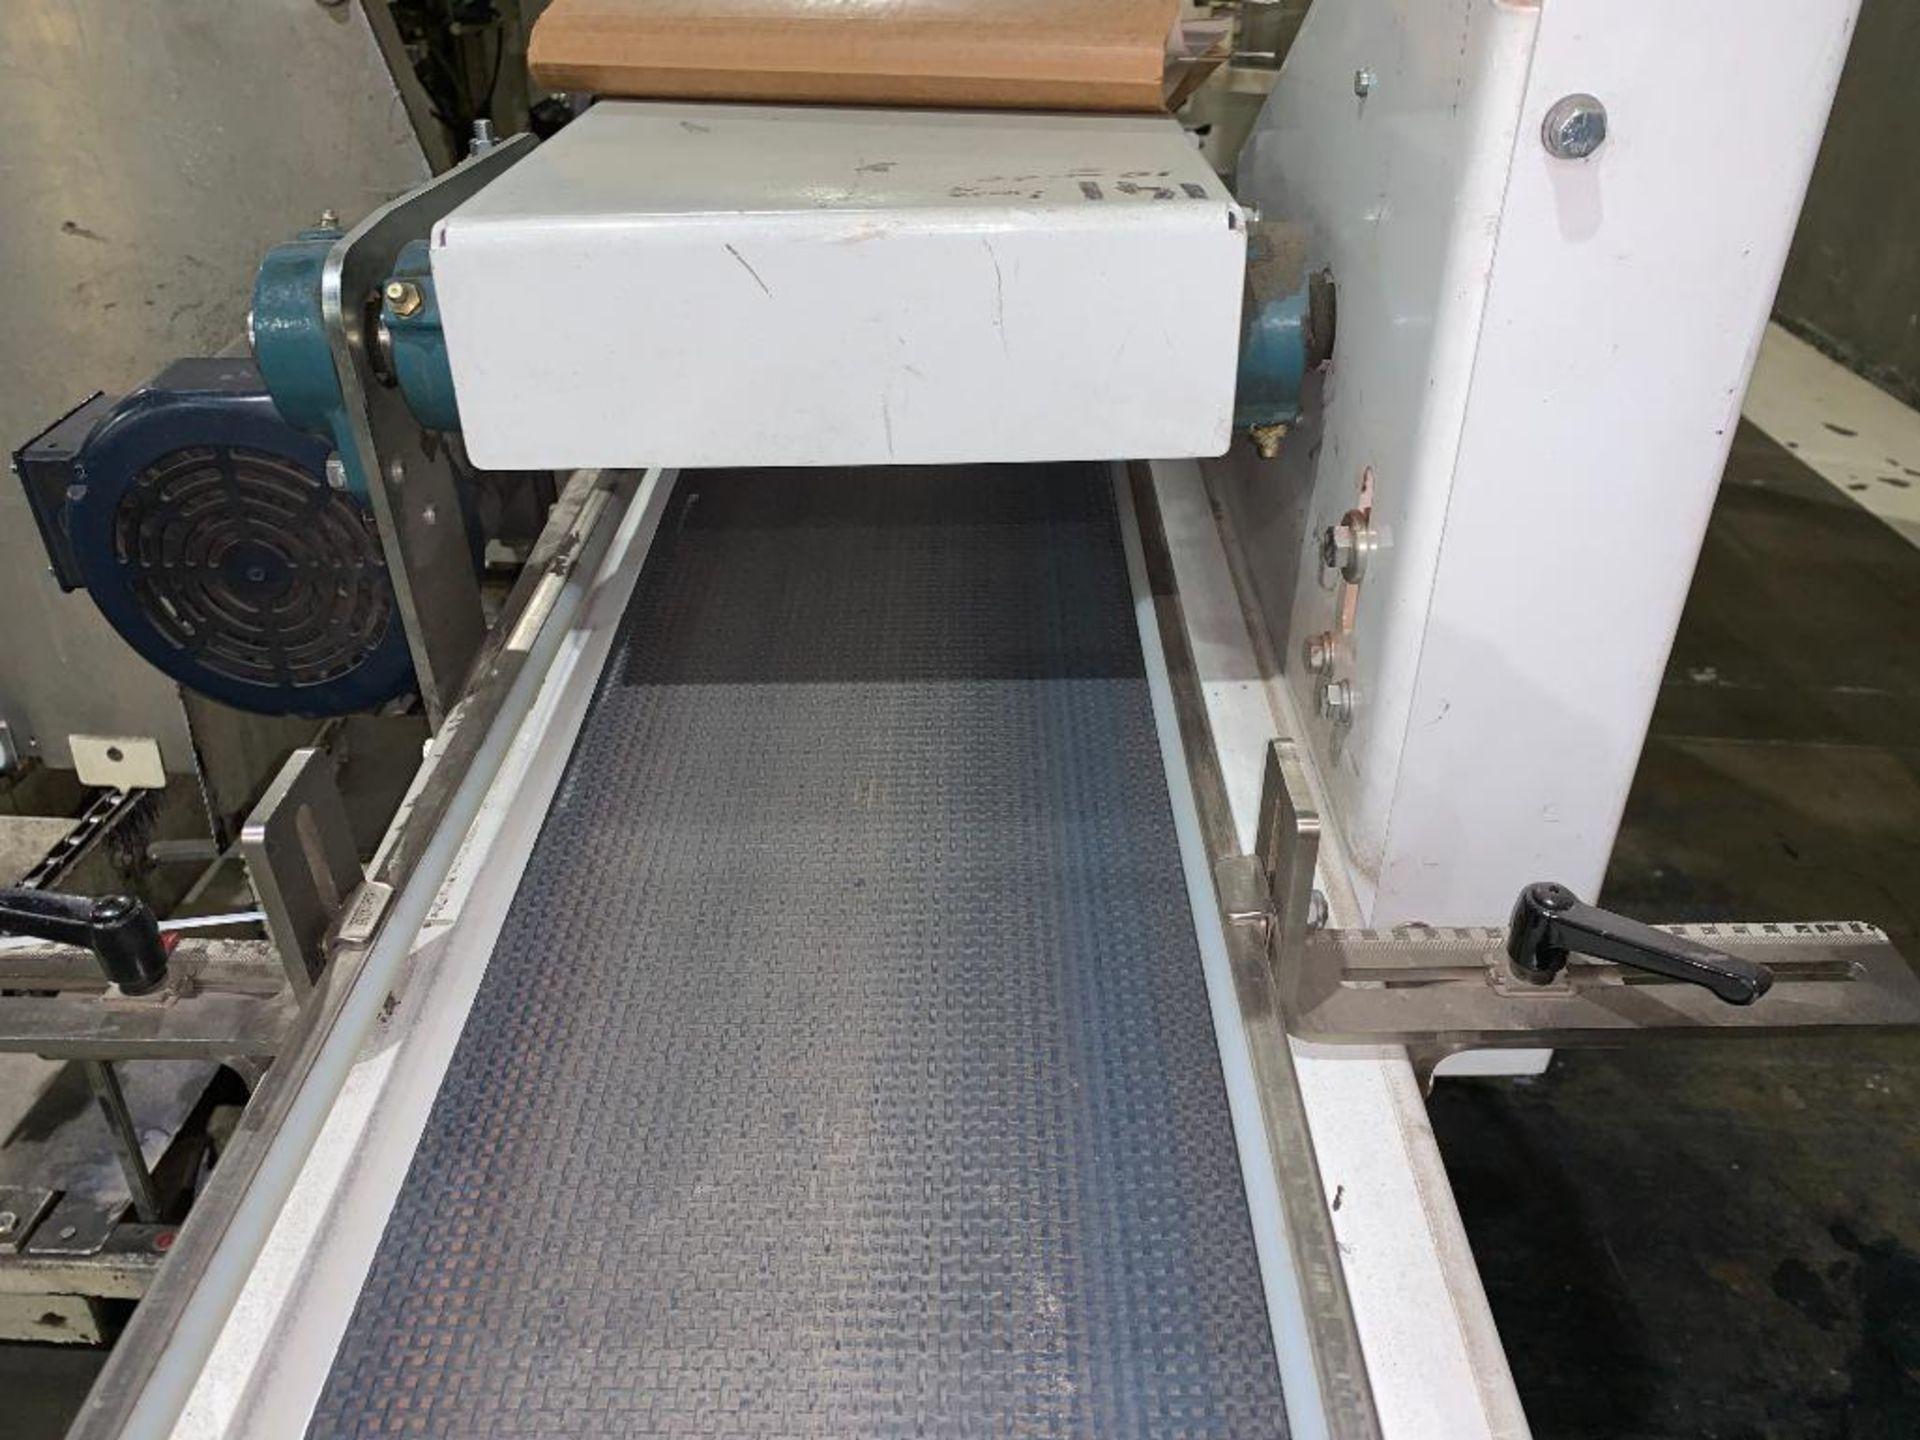 mild steel belt conveyor, 68 in. x 10 in., with box conditioner - Image 7 of 13